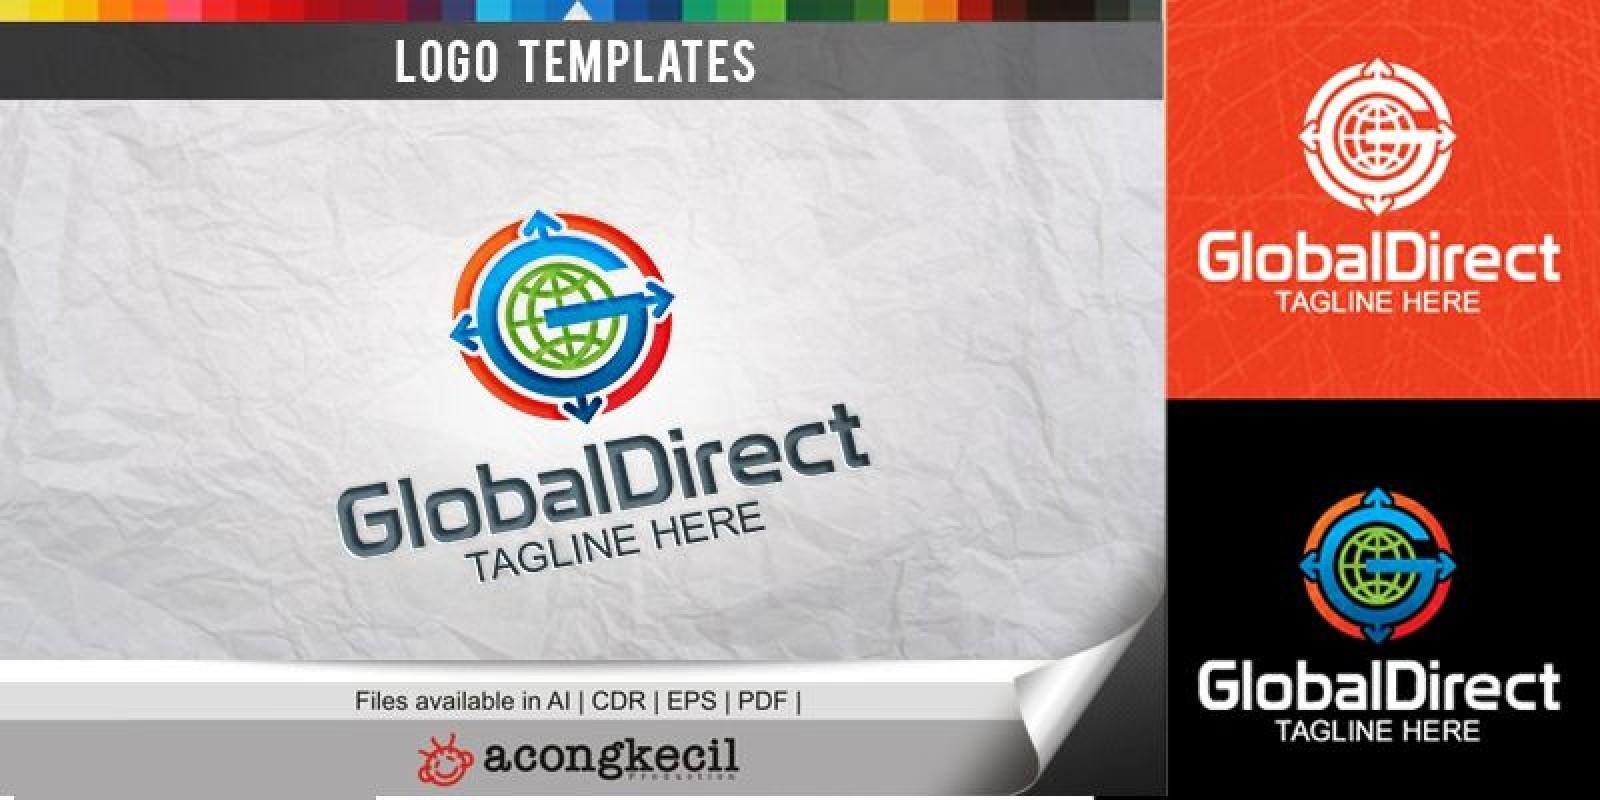 Global Direct - Logo Template